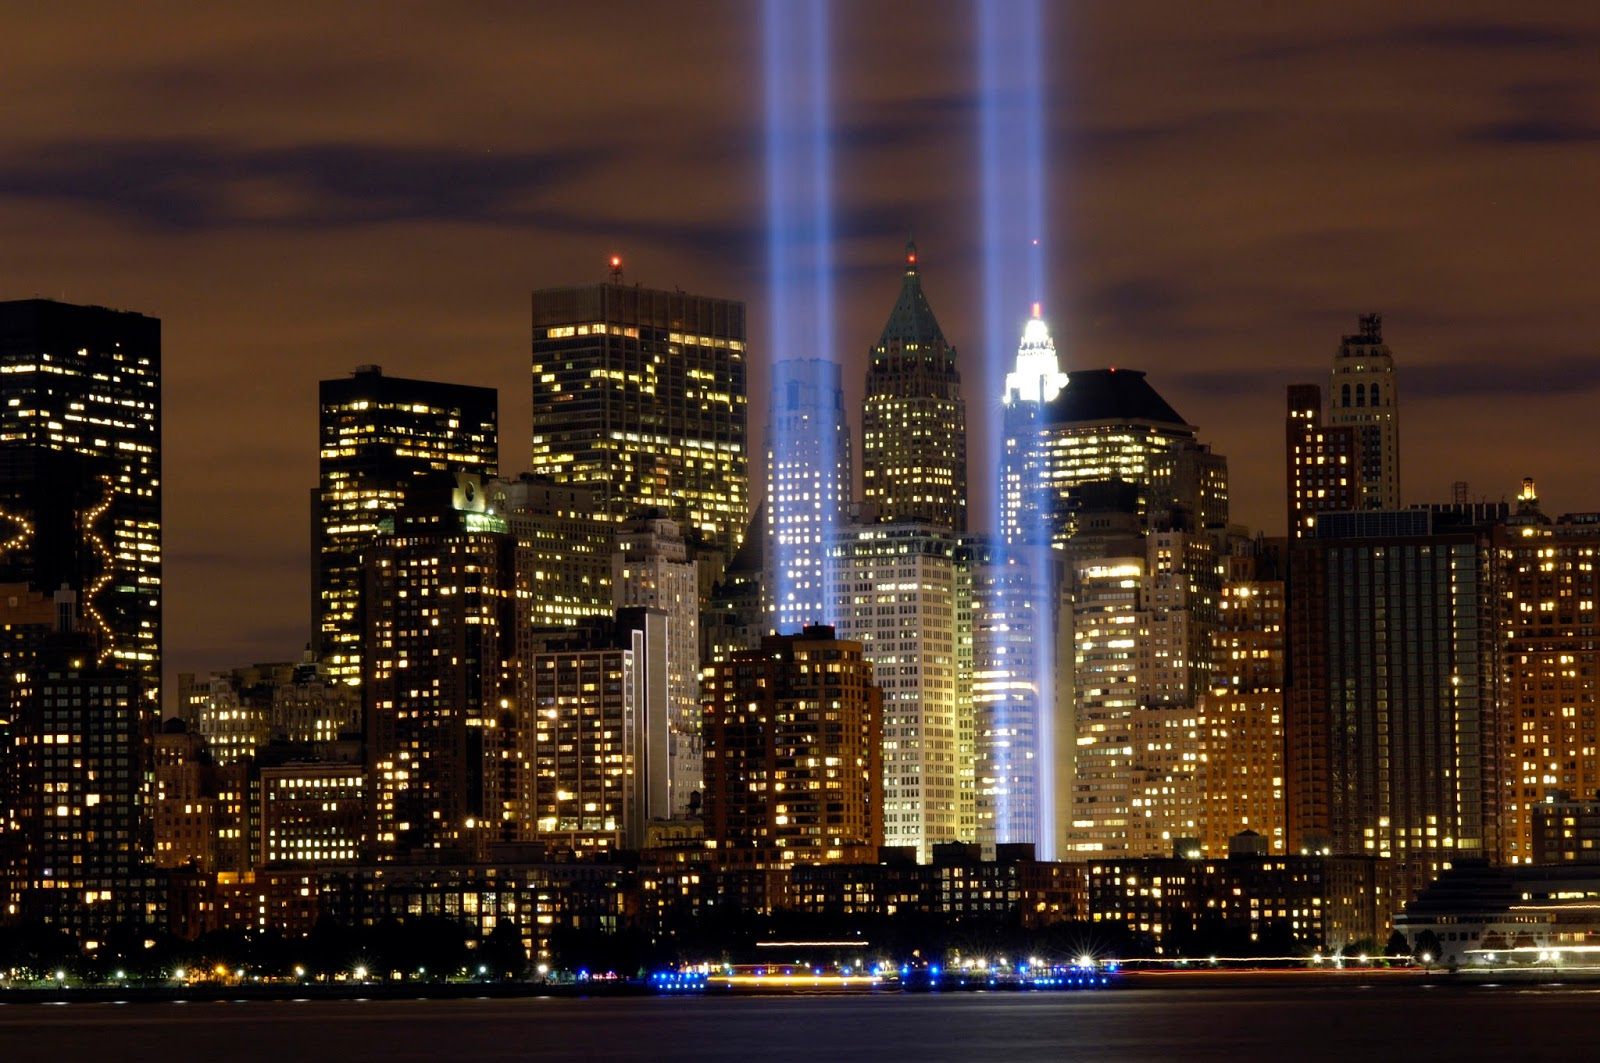 14 years since 911